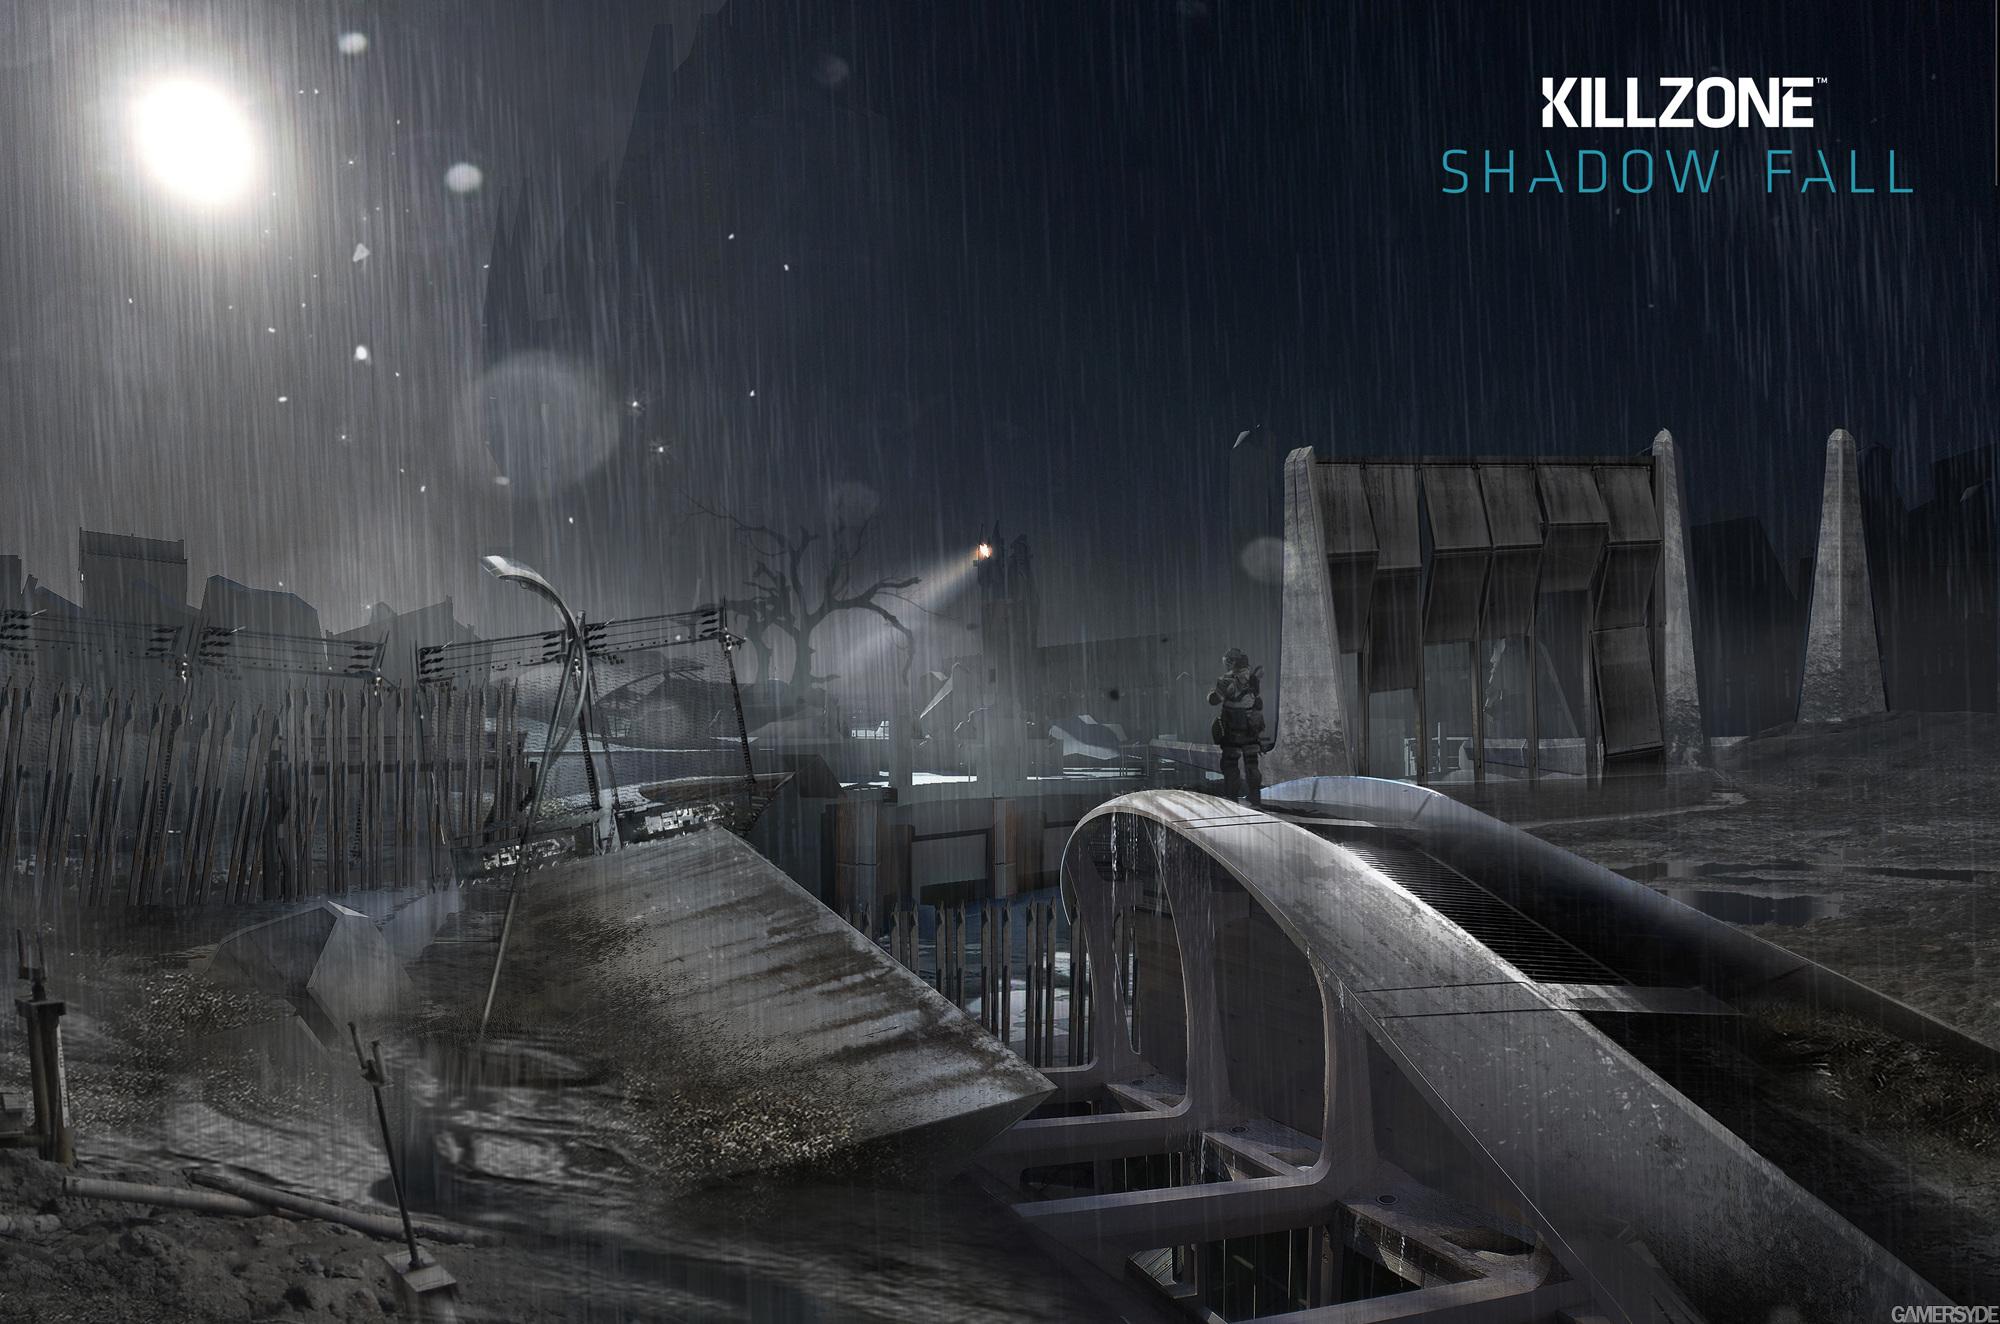 image killzone shadow fall 22886 2660 0003 چند تصویر هنری جدید از عنوان Killzone:Shadow Fall منتشر شد